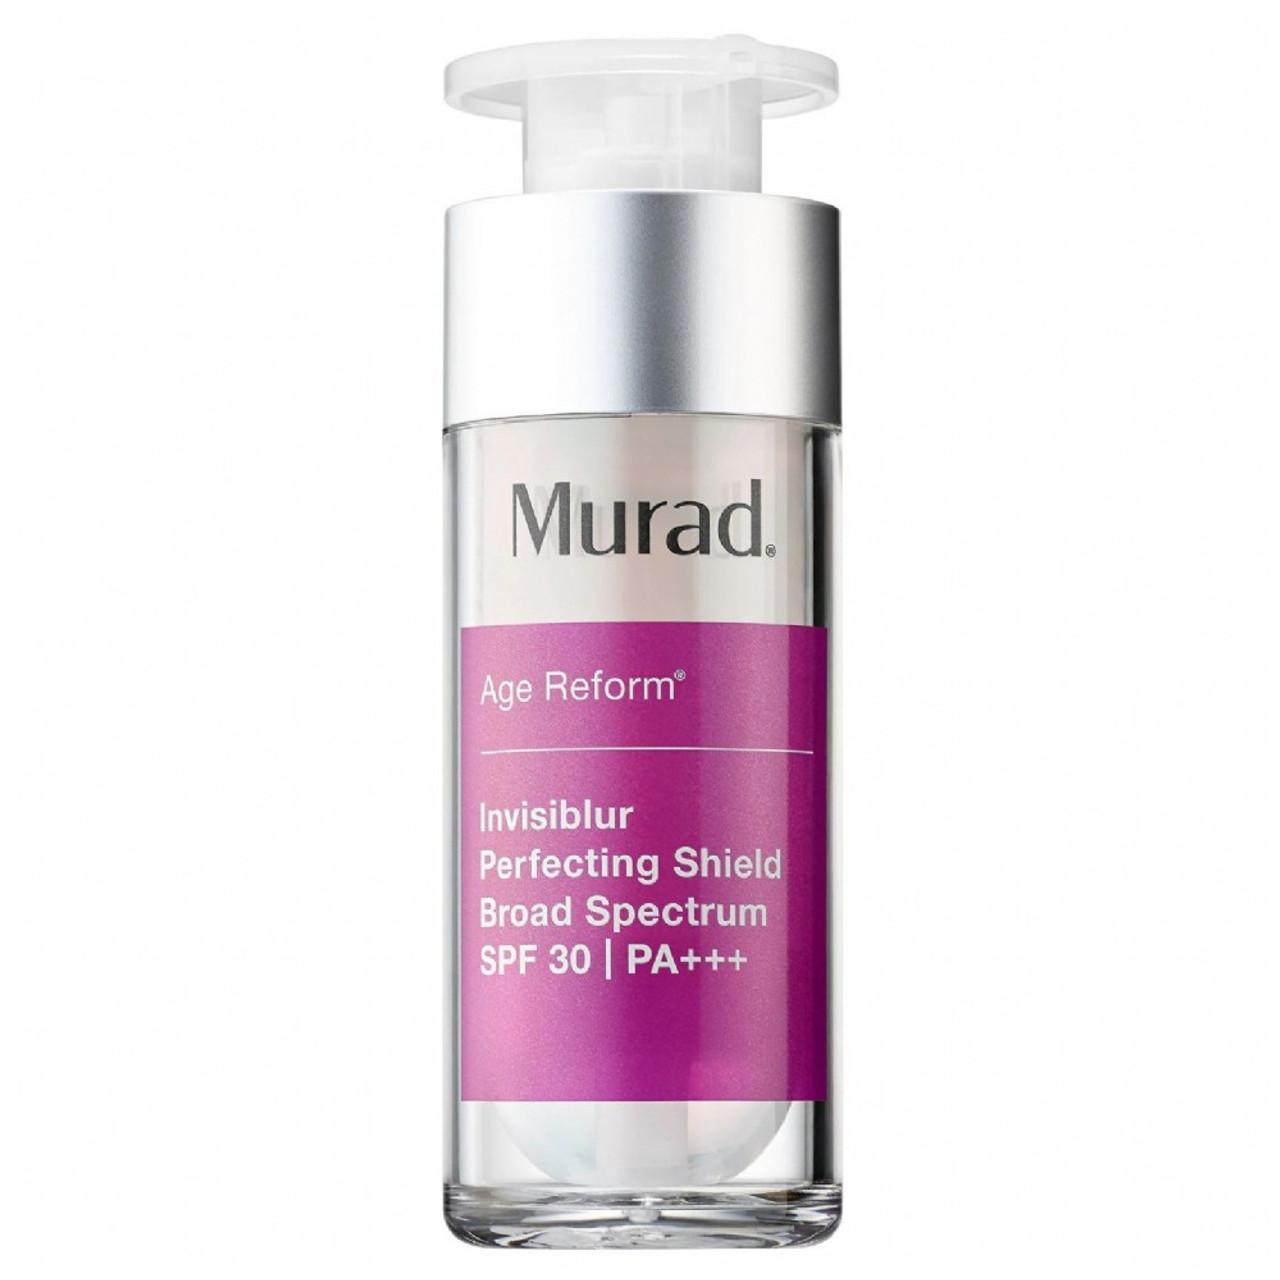 Murad Age Reform™ Invisiblur™ Perfecting Shield Broad Spectrum SPF 30 PA+++